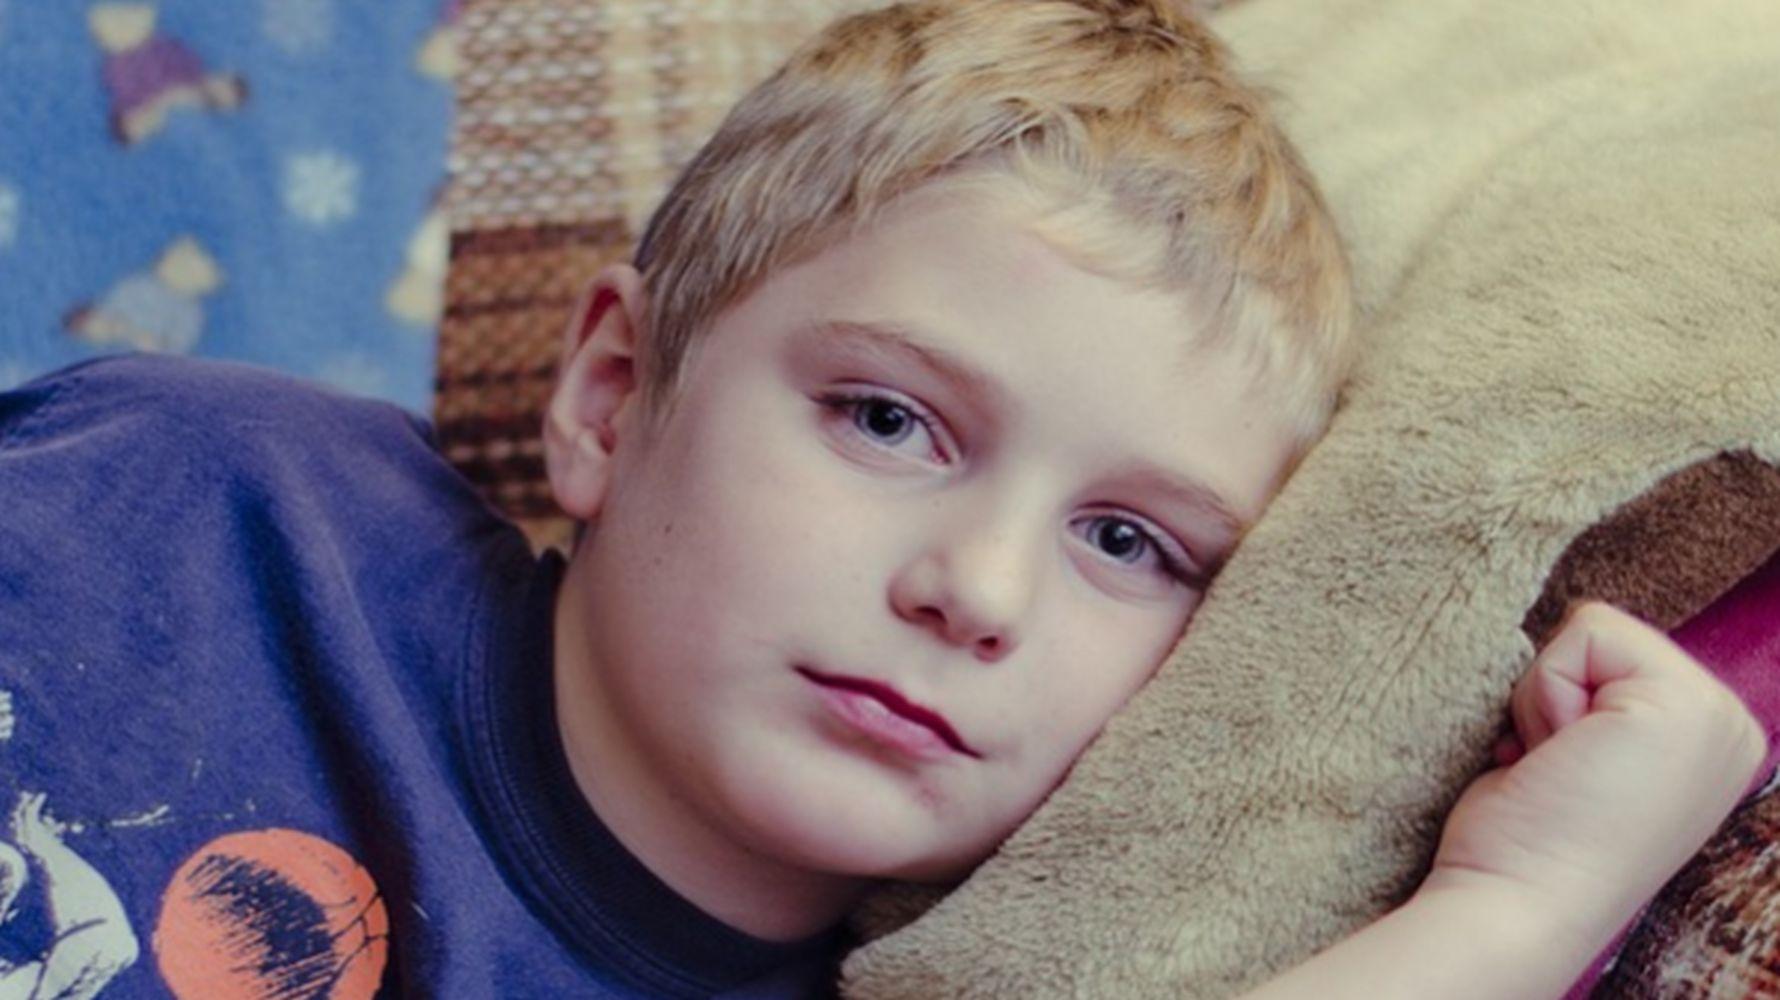 fear of coronovirus can make children sick